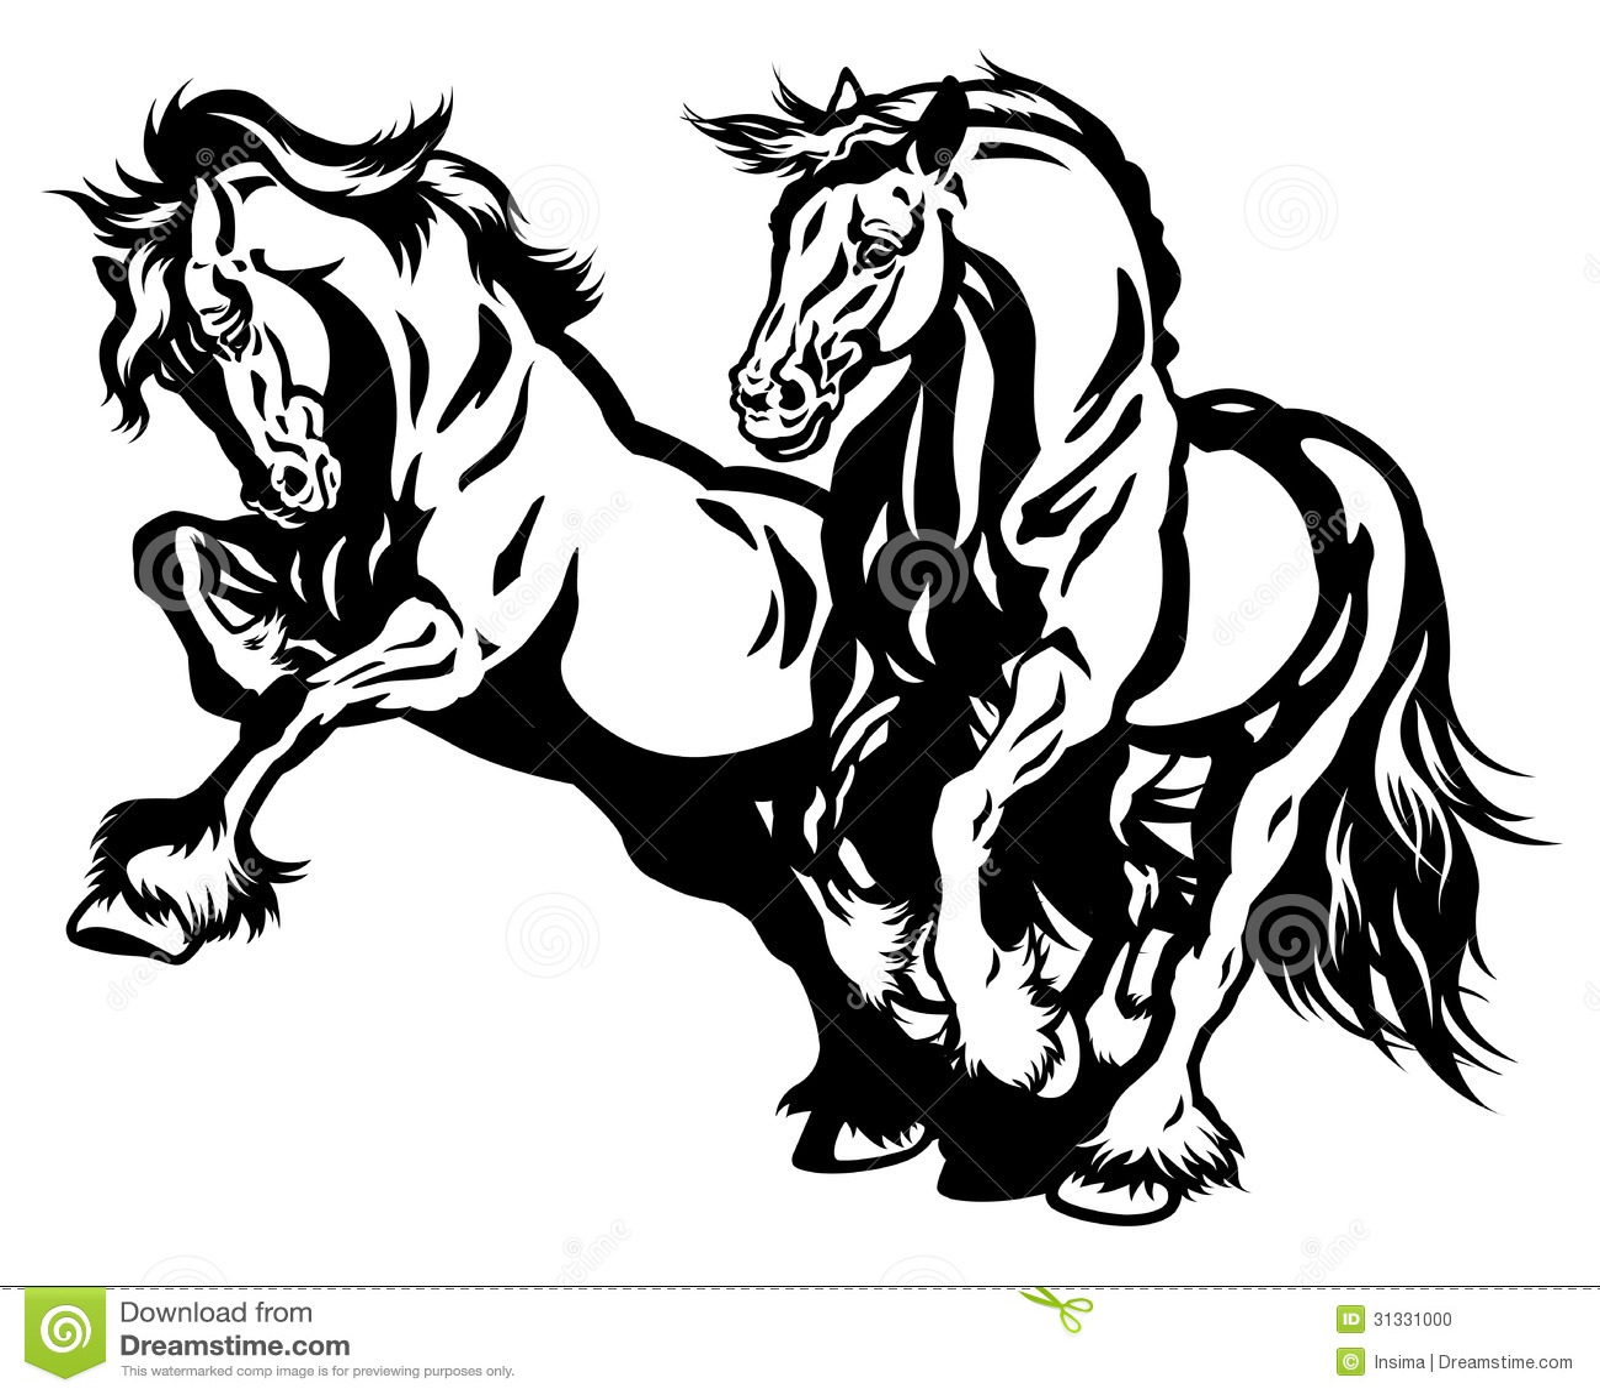 Two Draft Horses Black White Stock Photo